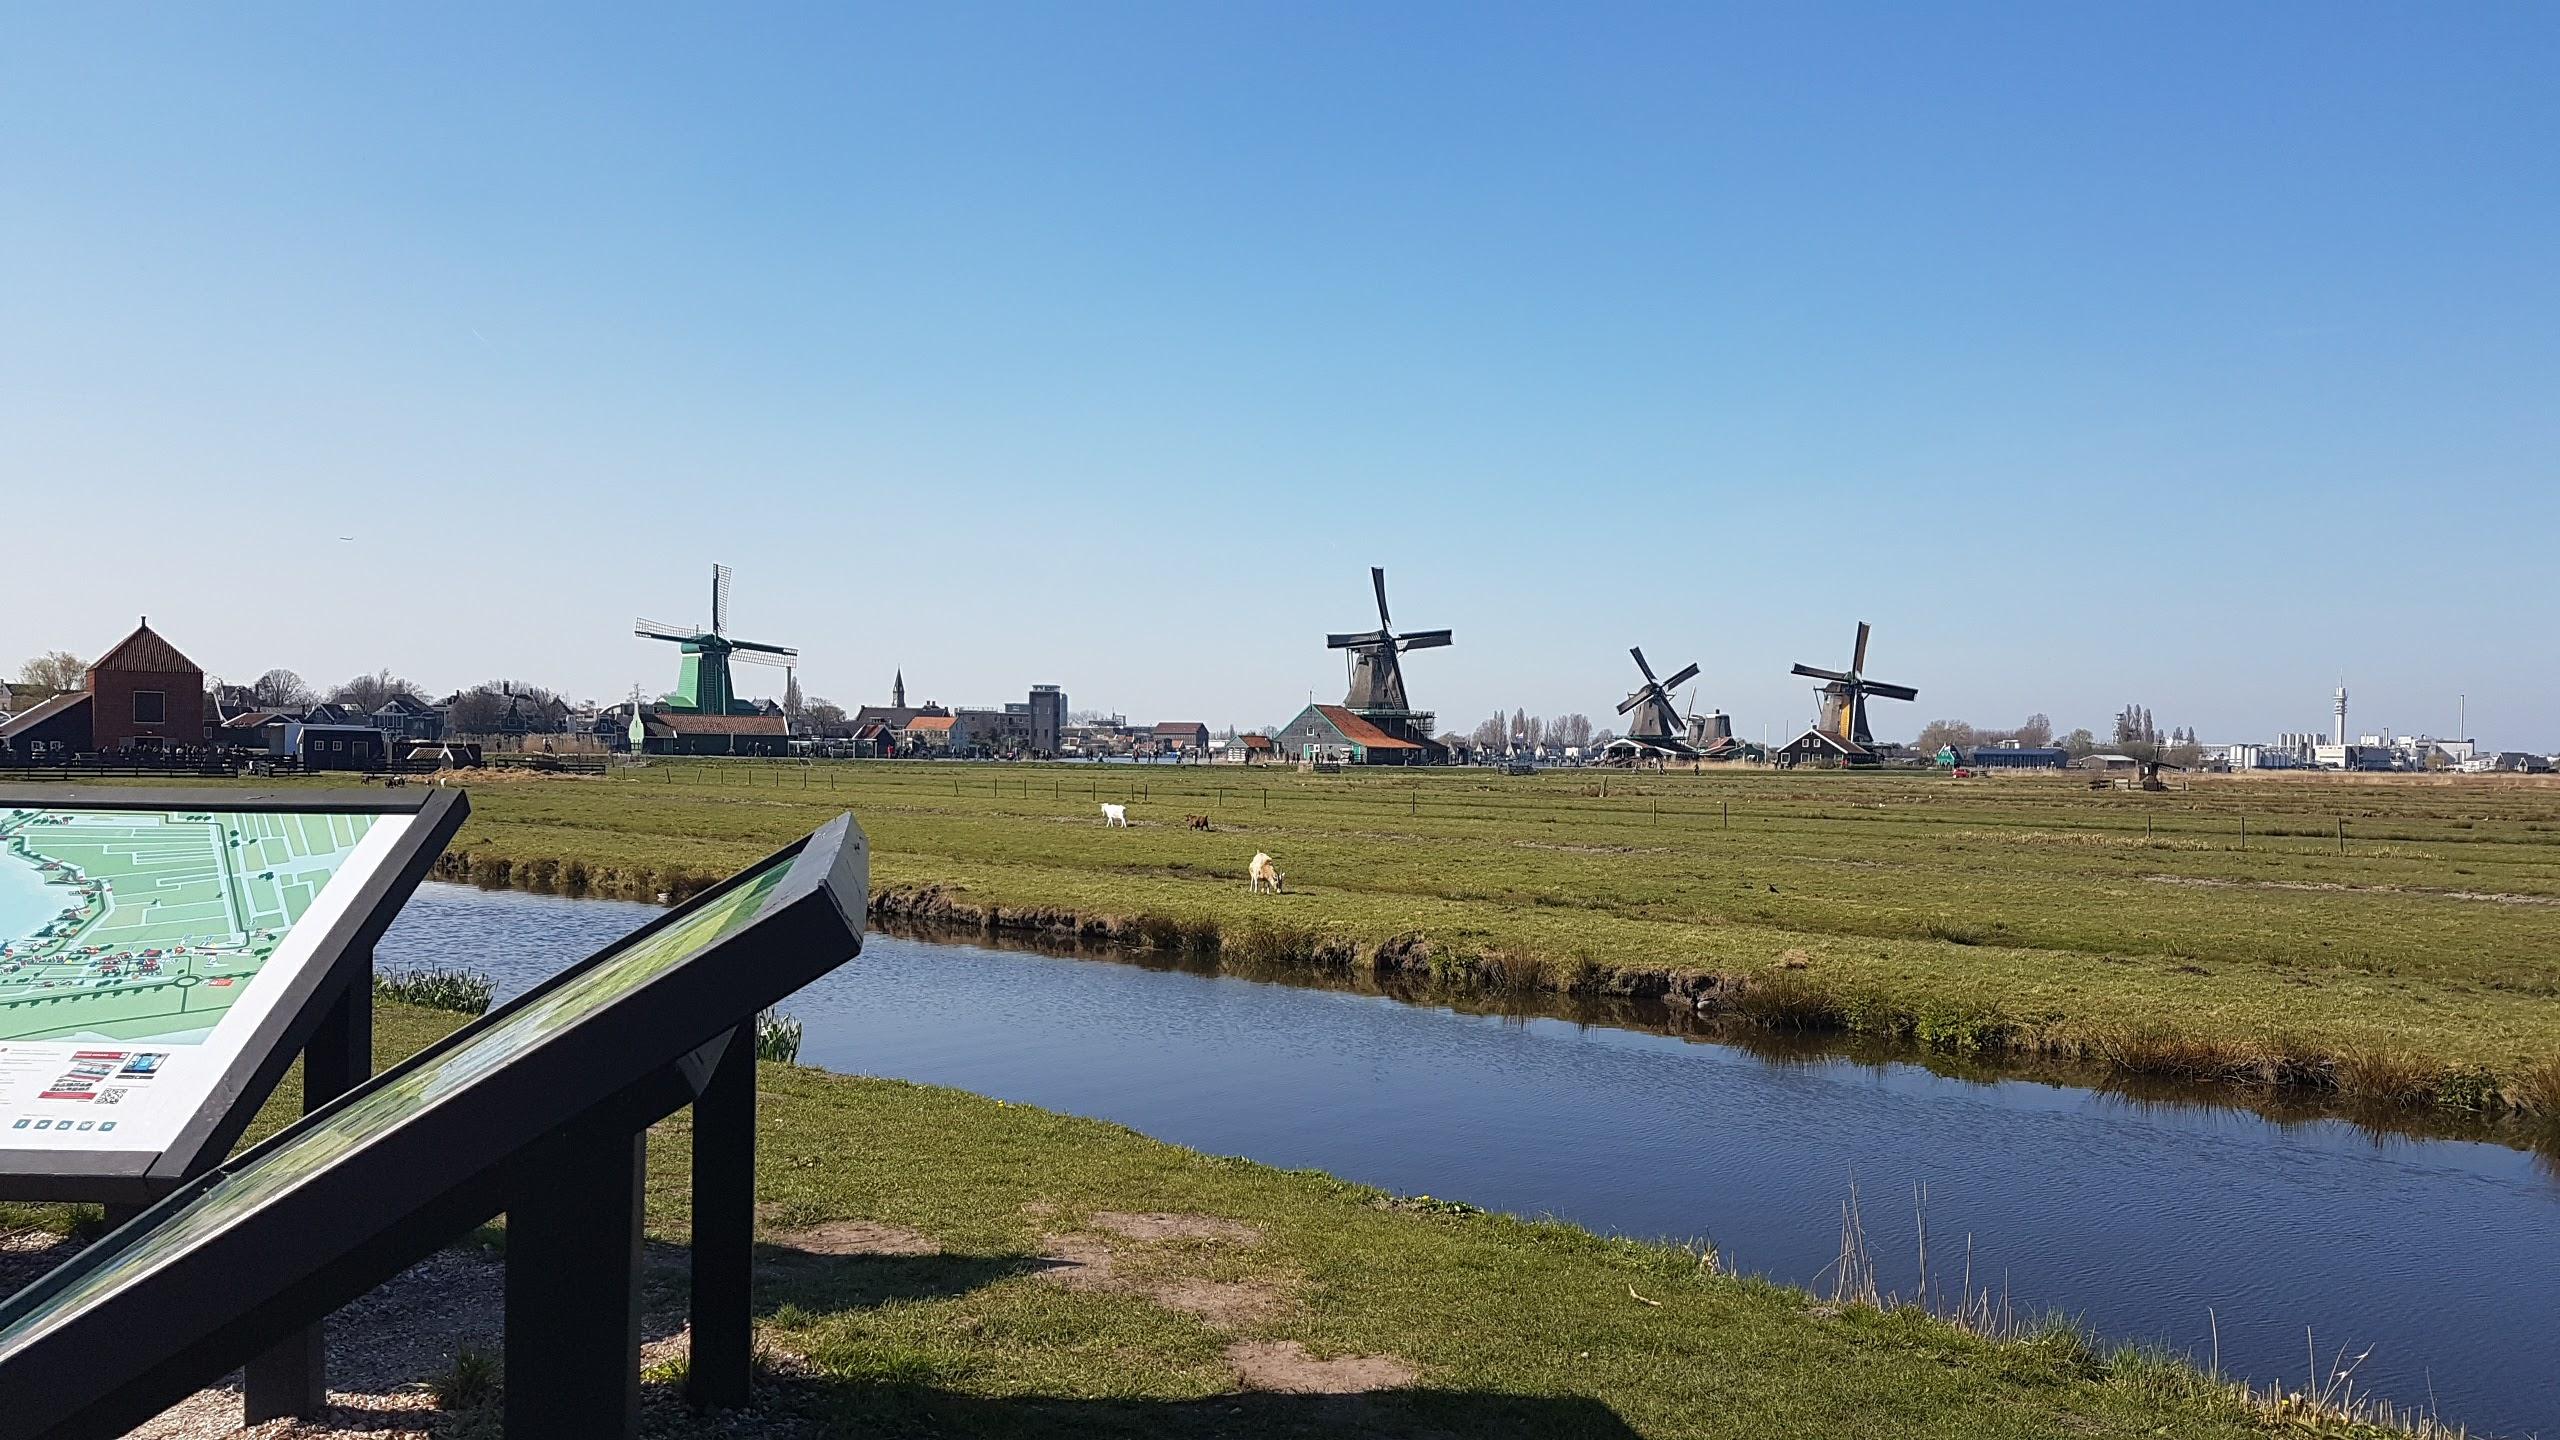 Zaanse Schans, Kincir Angin Belanda, Kincir Angin Tradisional, Wisata Belanda, Pemandu Wisata Orang Indonesia